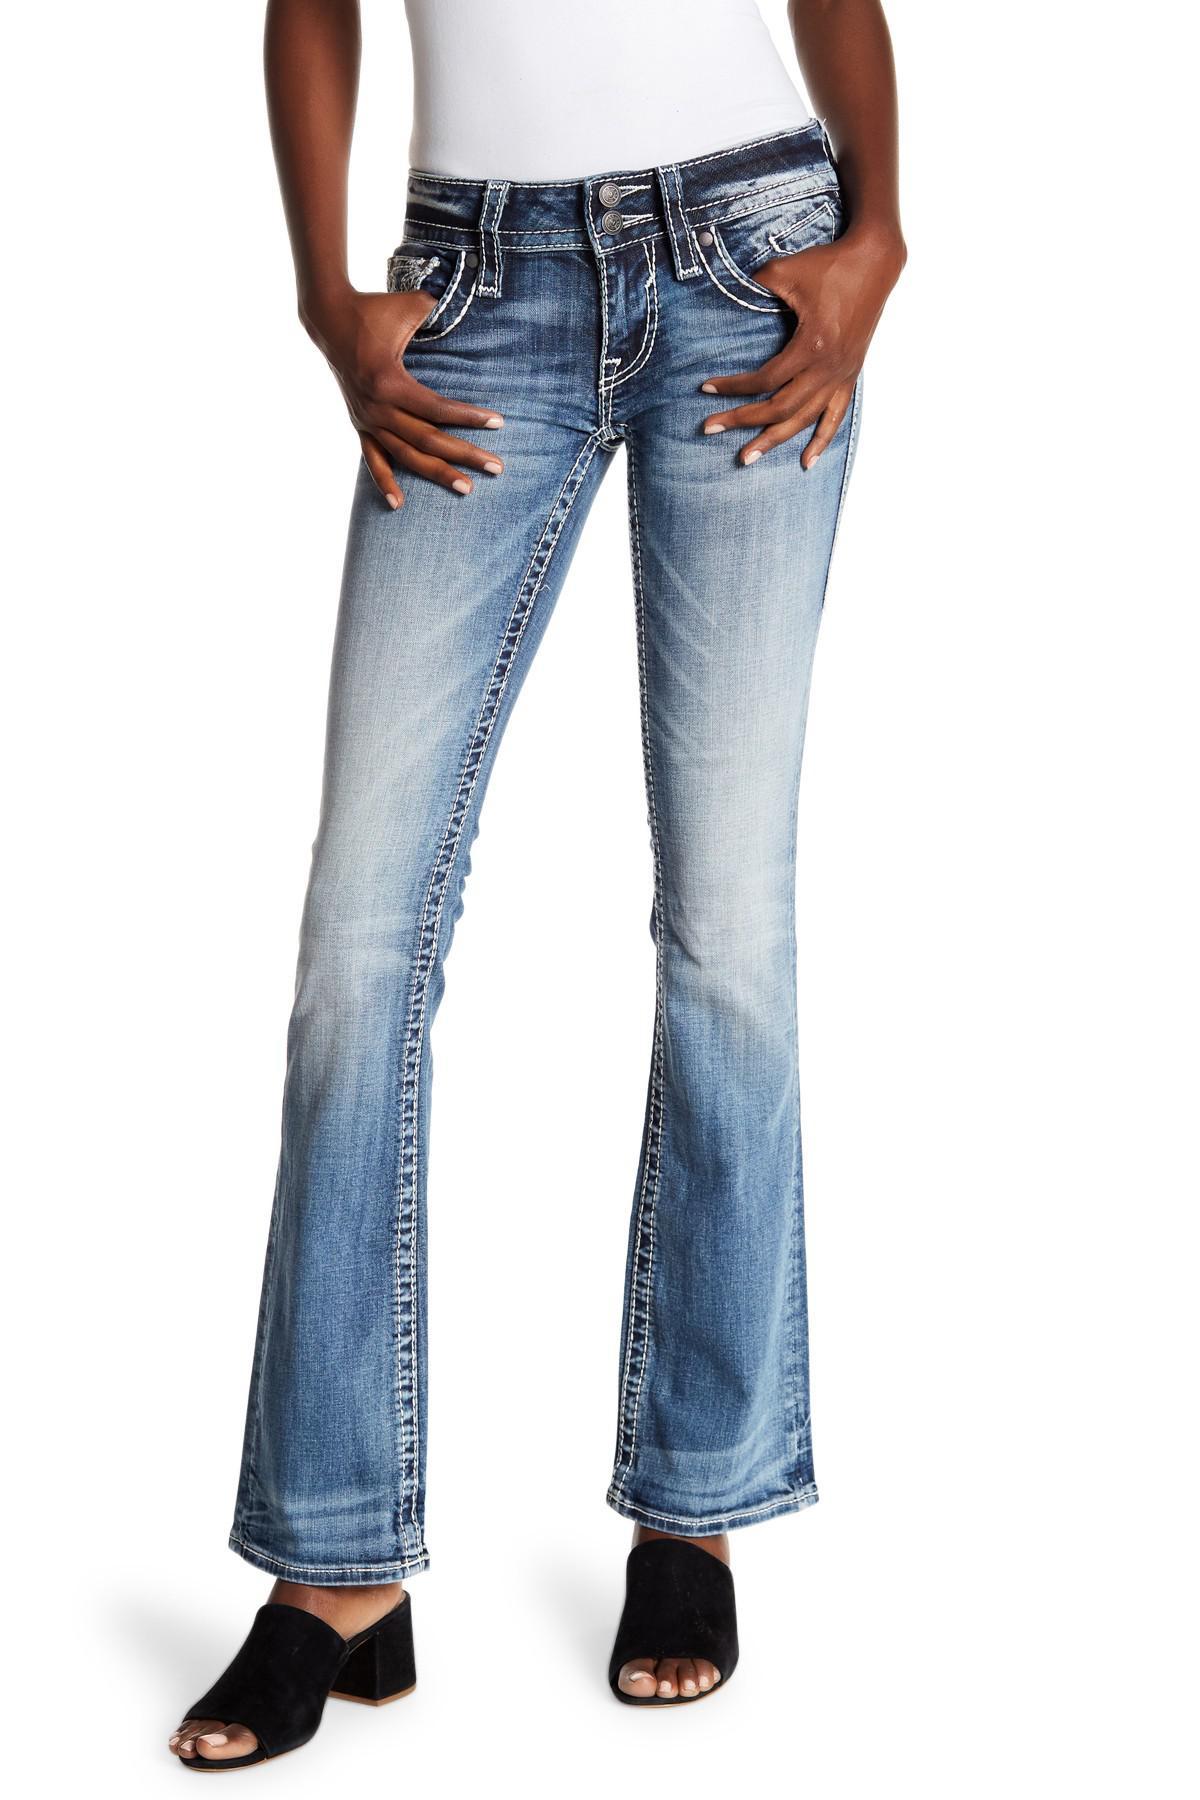 9acdcd2c178b9 Lyst - Vigoss Medium Wash Embellished Boot Cut Jeans in Blue